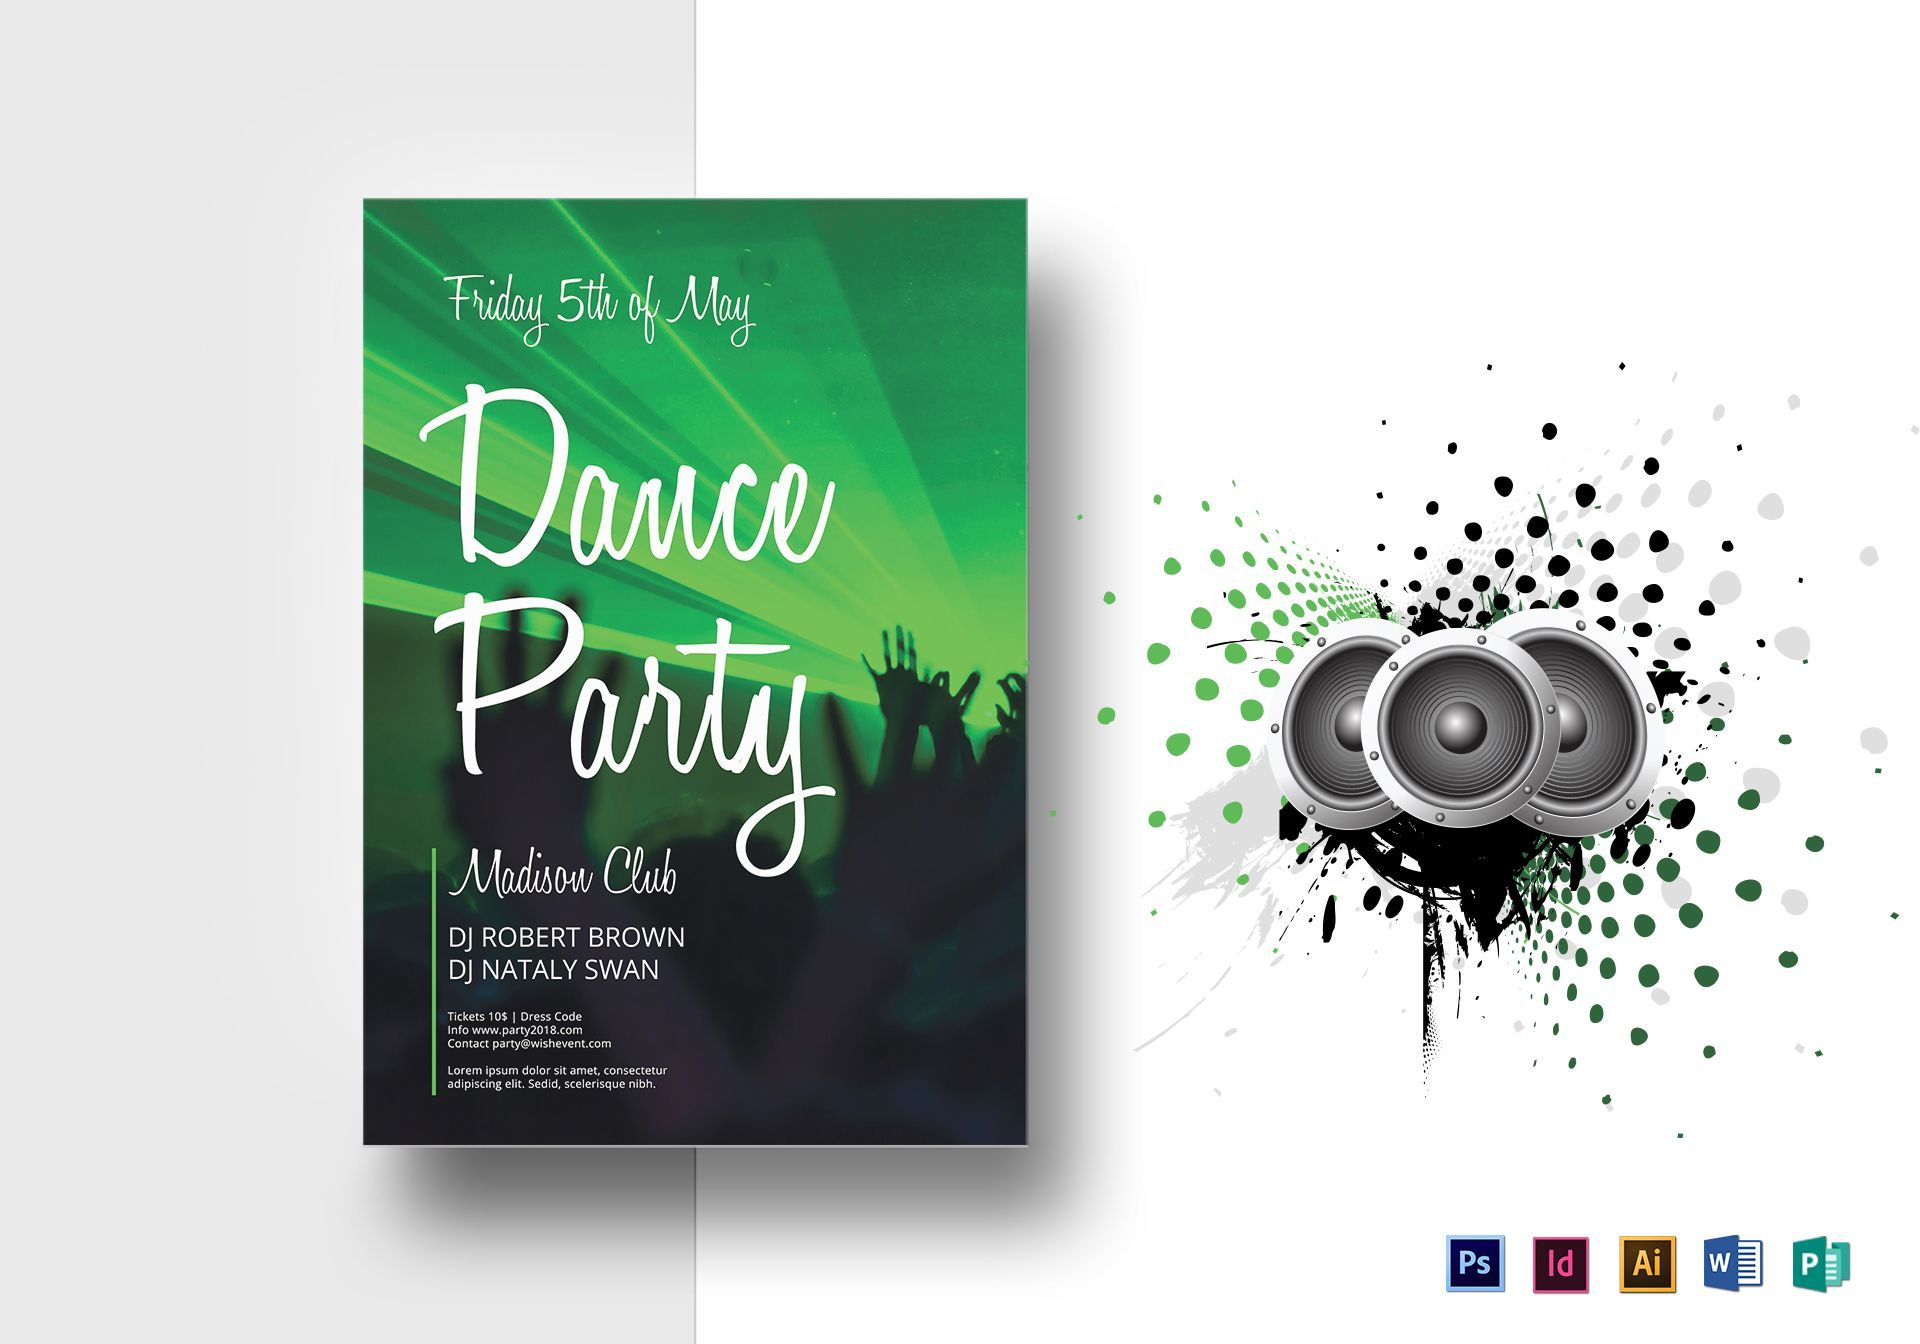 Dance Party Flyer Template Inside Dance Flyer Template Word Fugozinsurance Ga Party Flyer Flyer Template Flyer